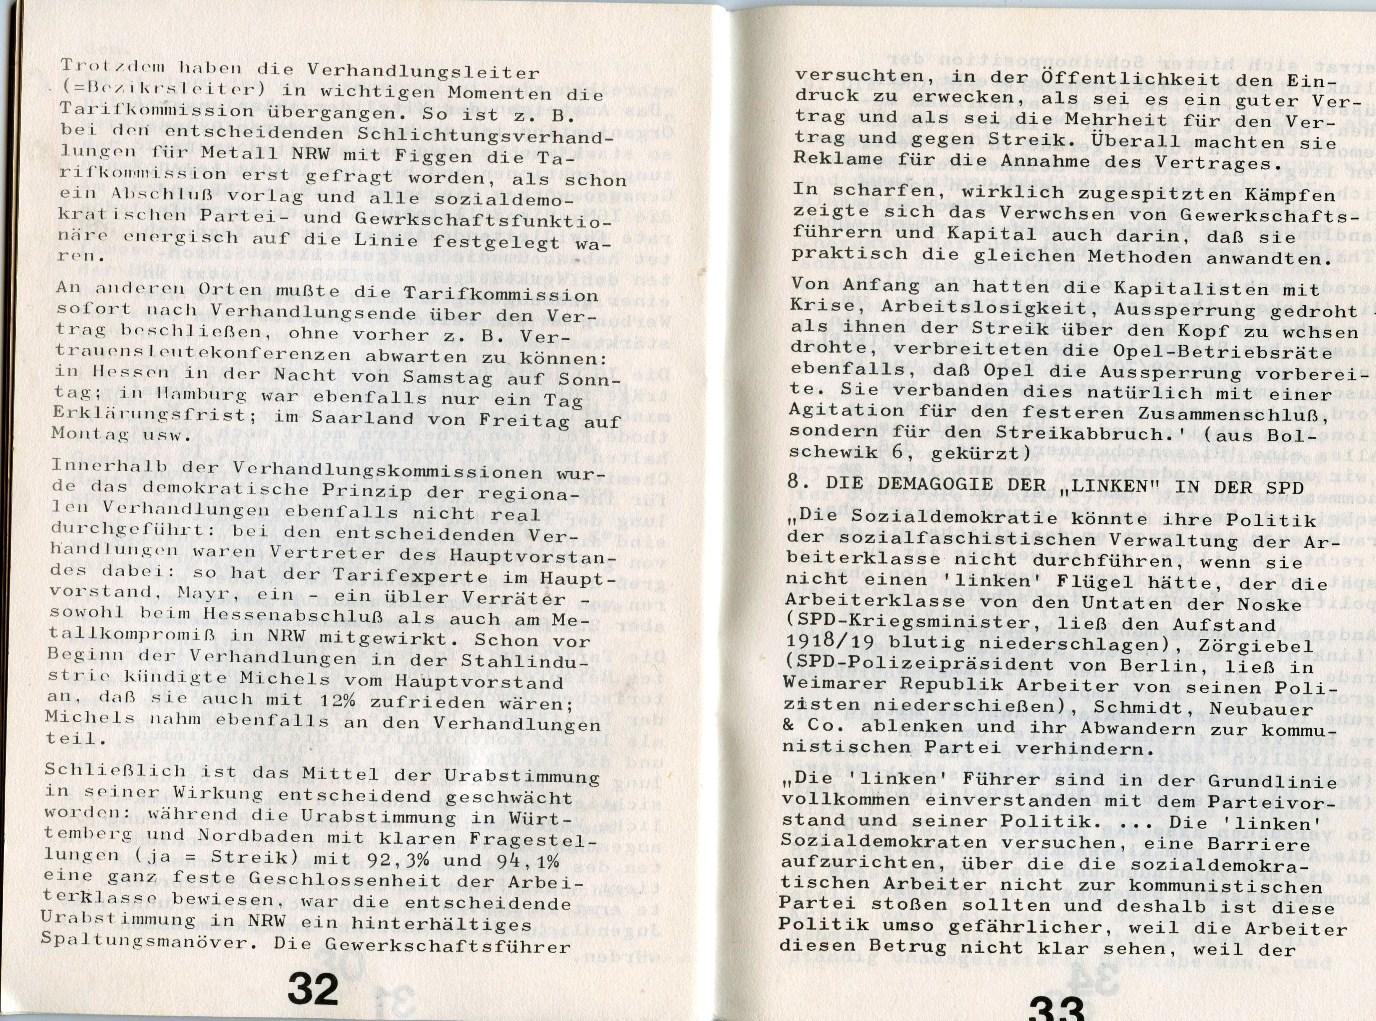 KJVD_Sozialdemokratie_Sozialfaschismus_1971_18